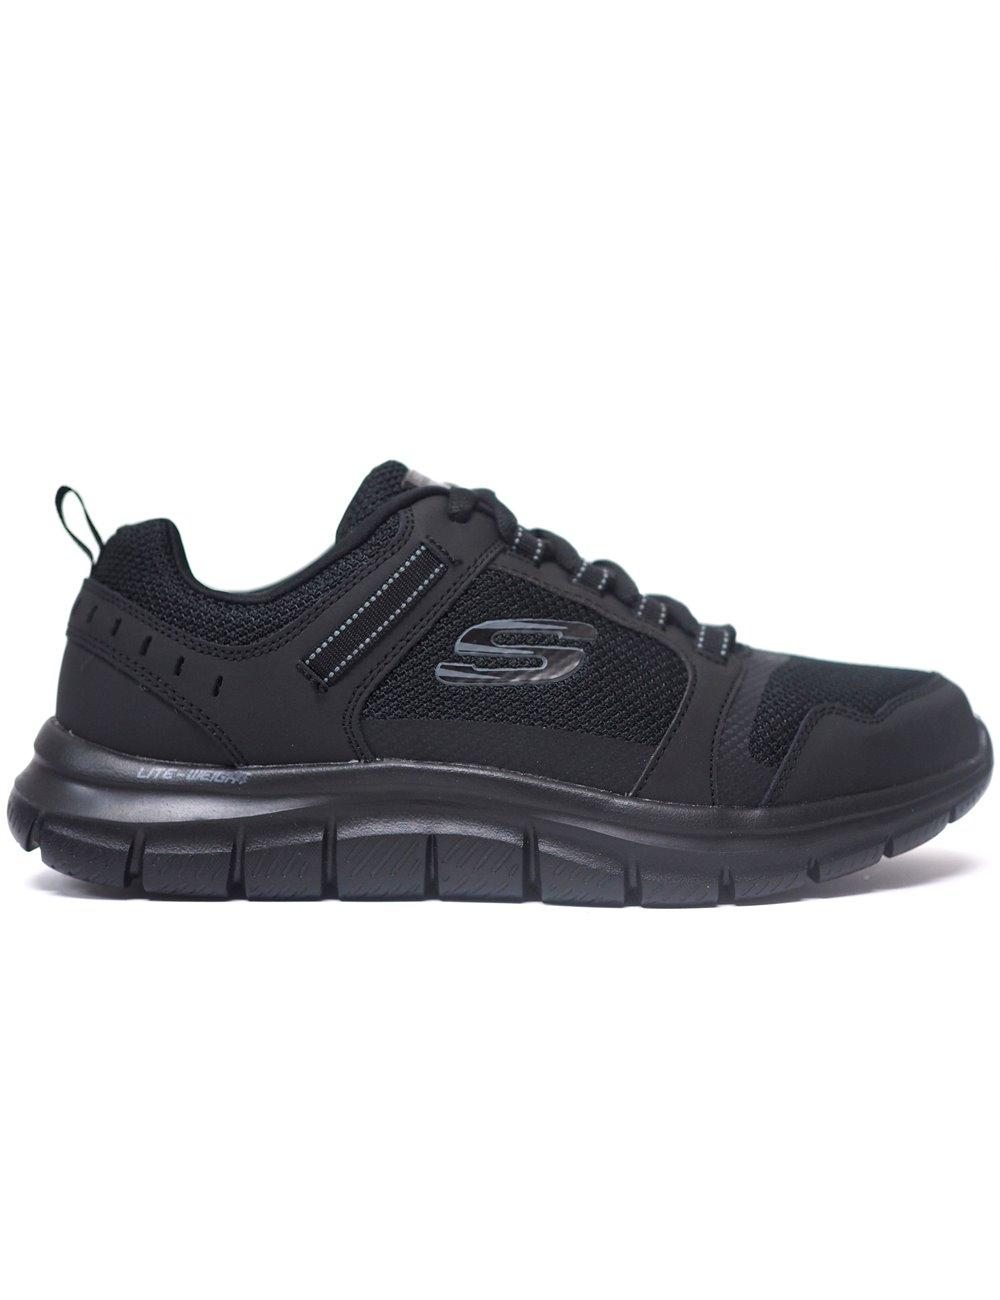 Zapatillas Skechers 232001 Negro